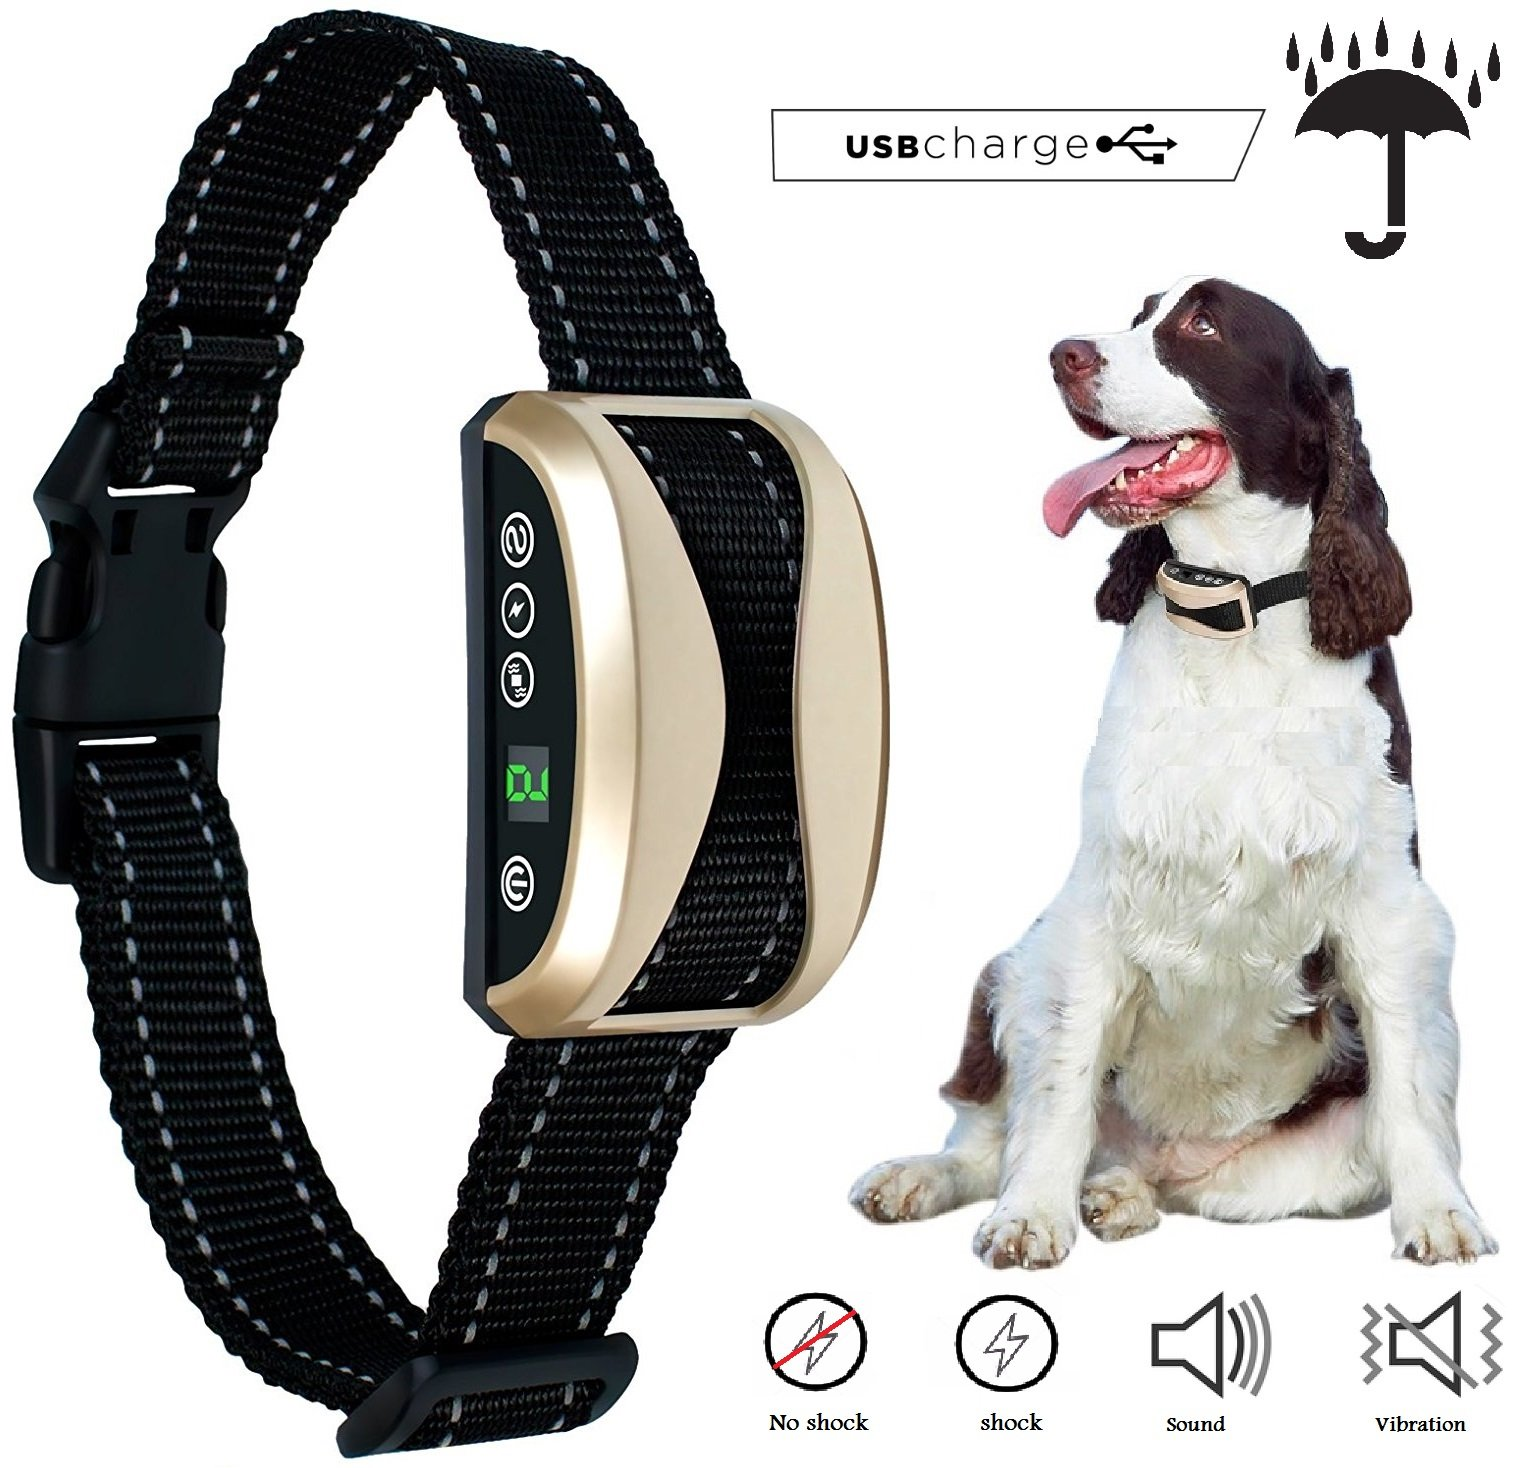 Winner360 [2018 NEW CHIP] No Bark Dog Collar Rechargeable Barking Control Collar Beep Vibration Safe Shock & Anti Bark, Reflective for Small Medium Large Dogs